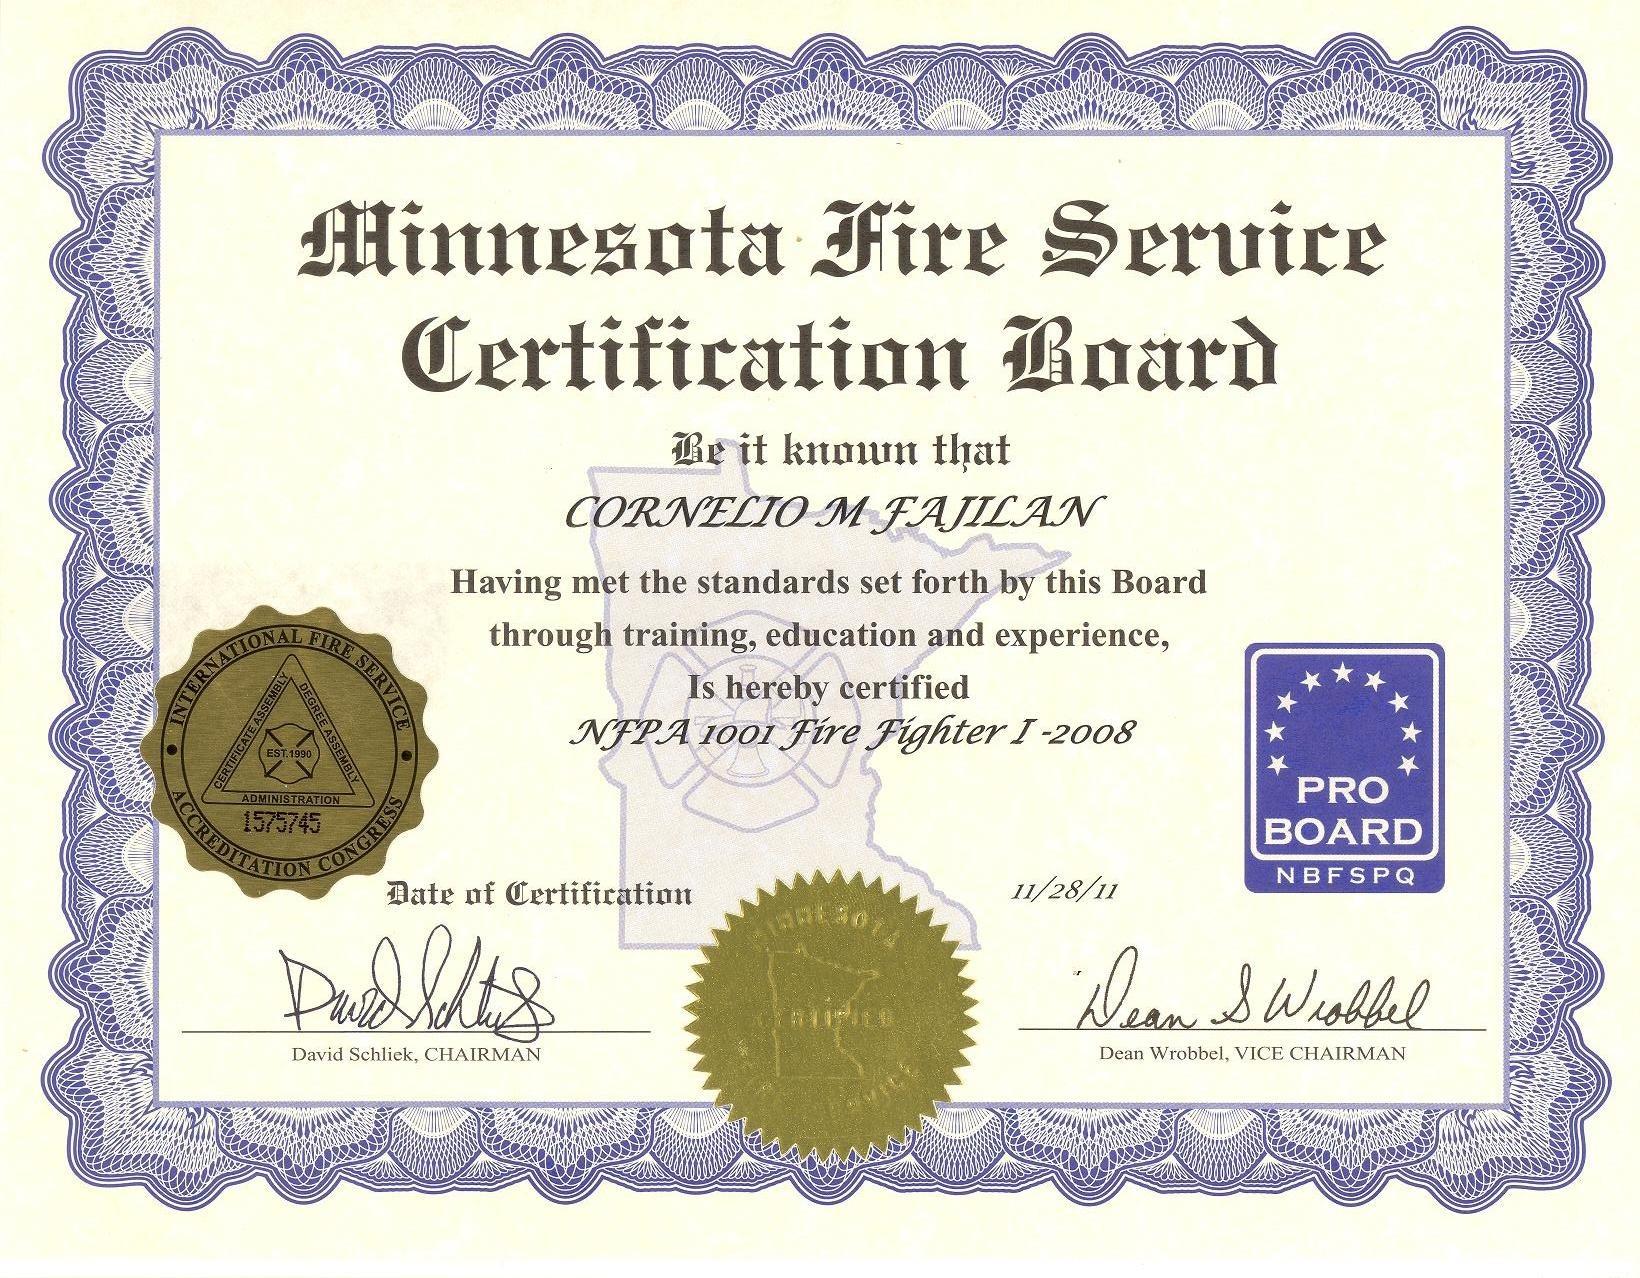 Cornelio fajilan bayt proboard firefighter 1 certificate 1betcityfo Gallery